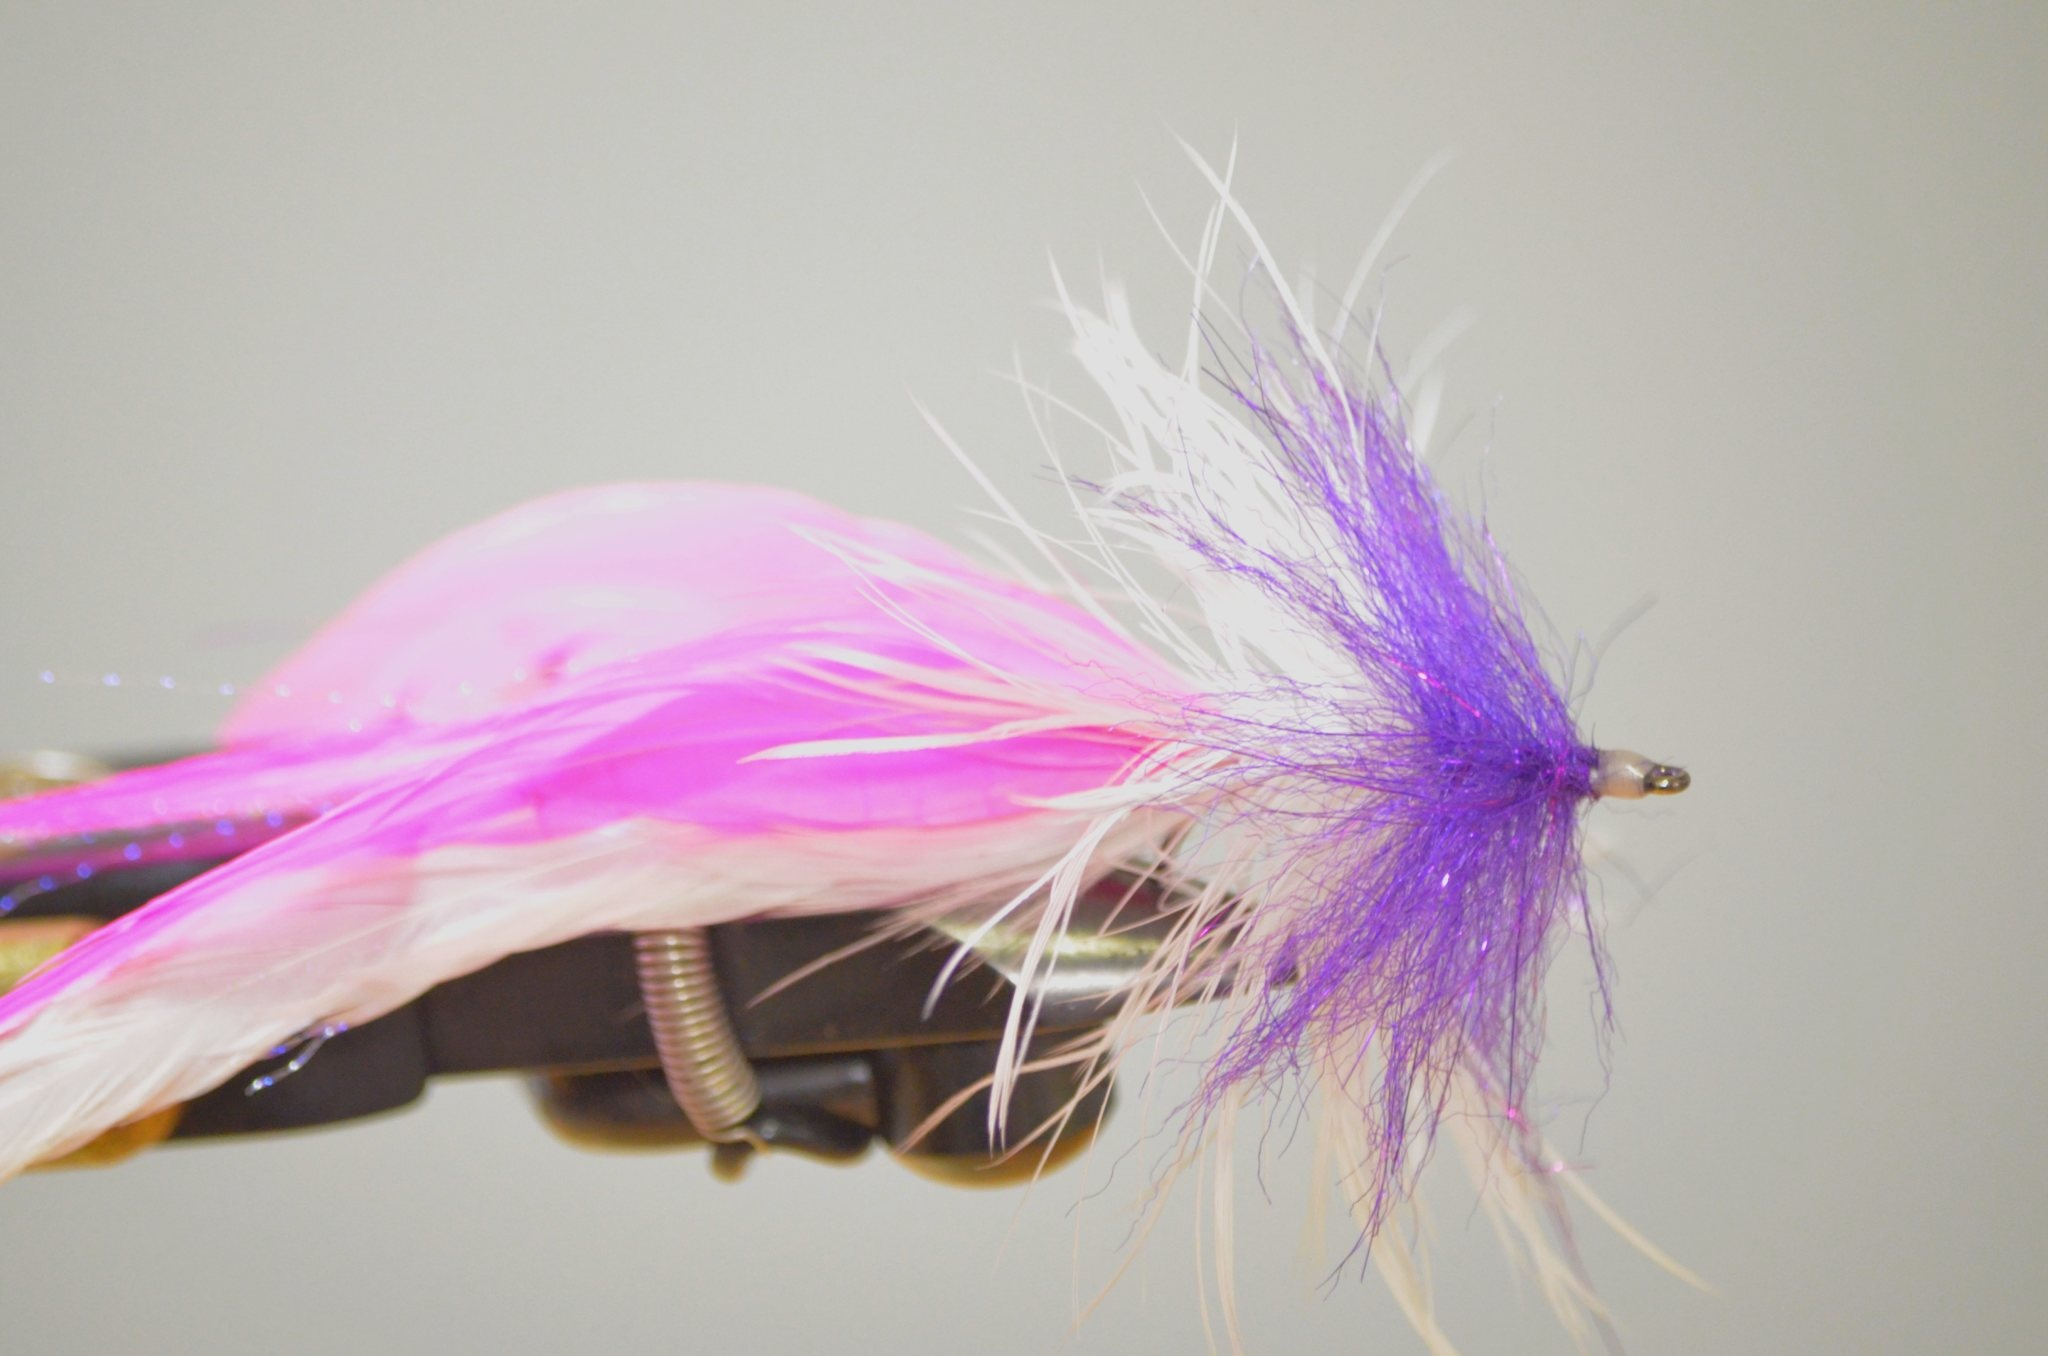 Urban Angler Fly Tying Kit - EP Tarpon AnadroDucer